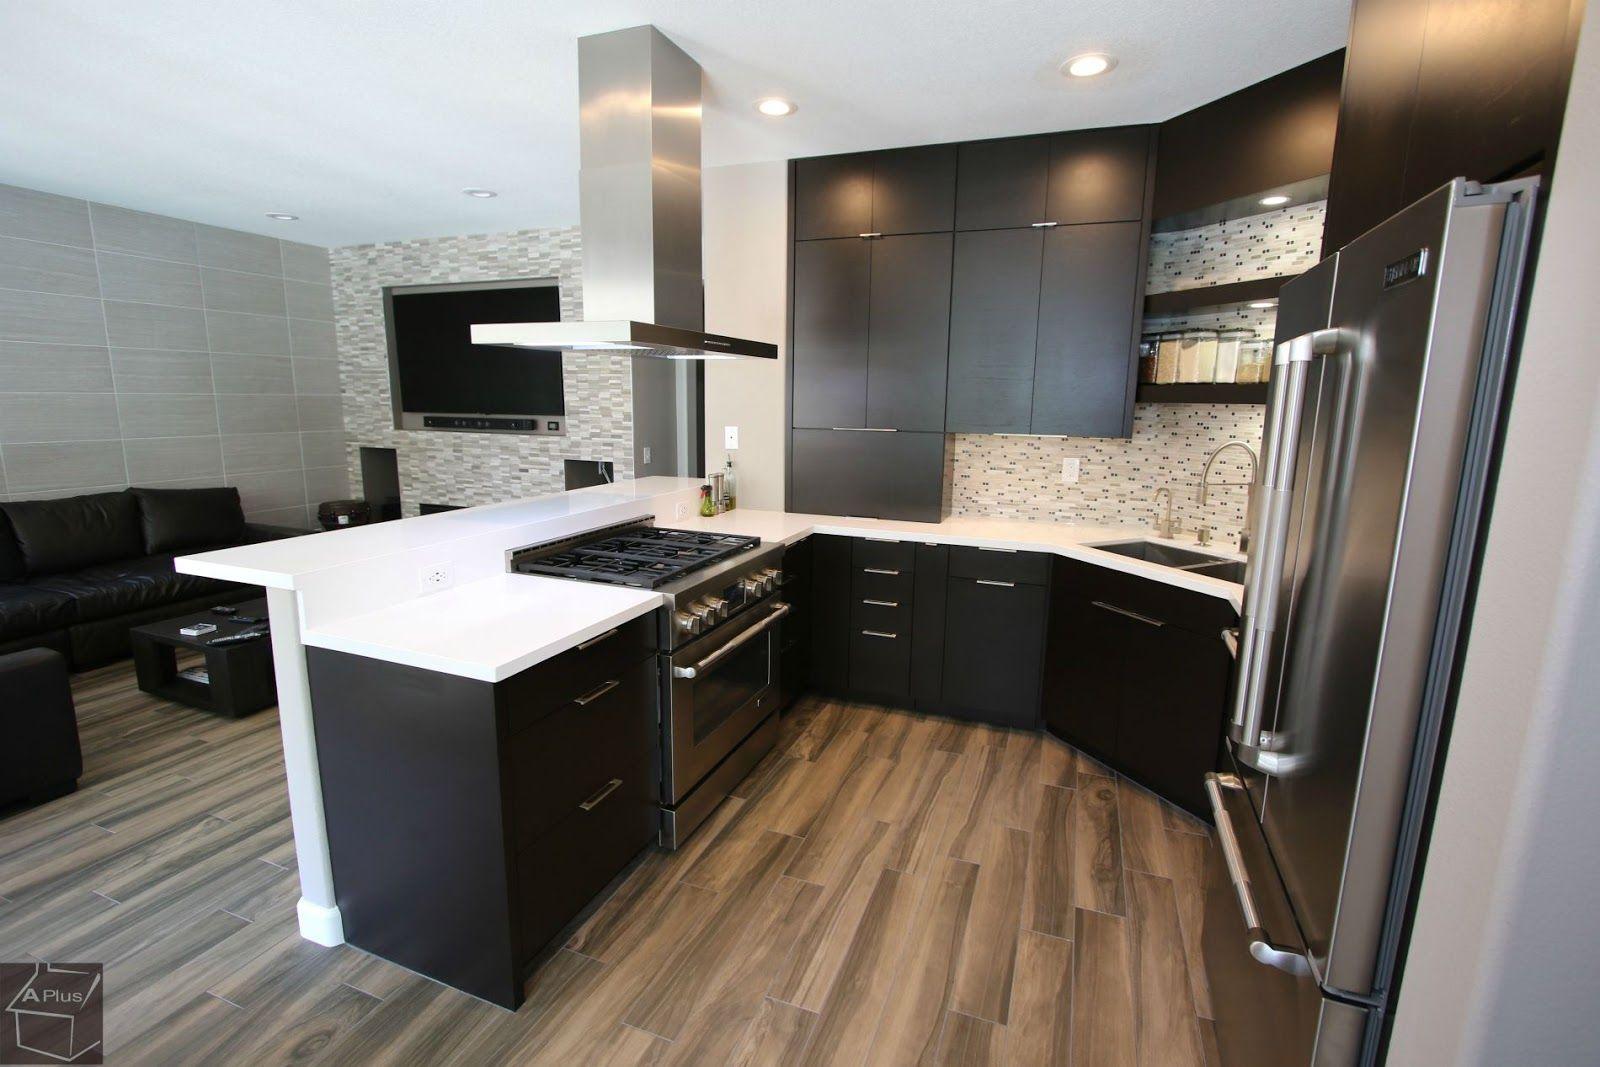 Kitchen Designer Orange County Adorable Design Build Modern Kitchen Remodel In Chino Hills  124  Dove Inspiration Design